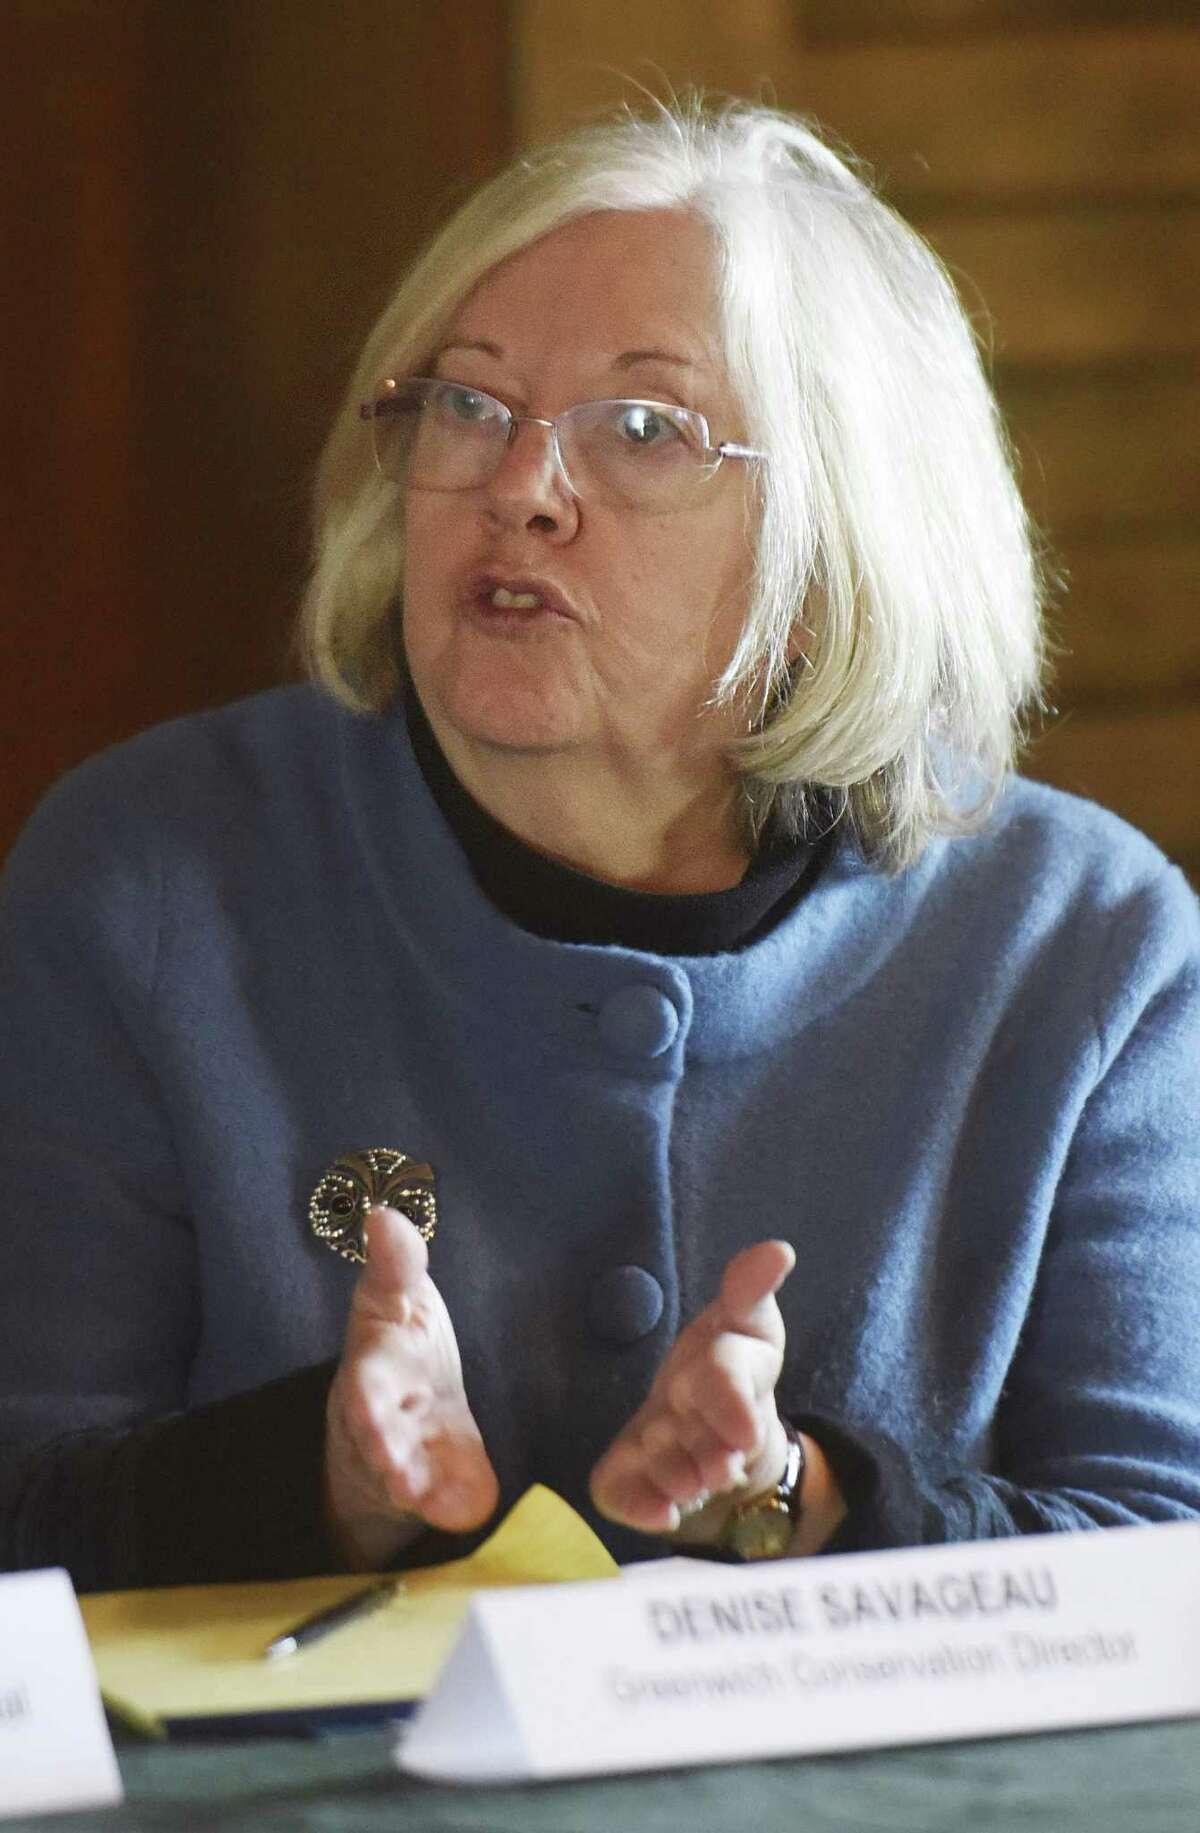 Denise Savageau, Greenwich Director of Greenwich Conservation